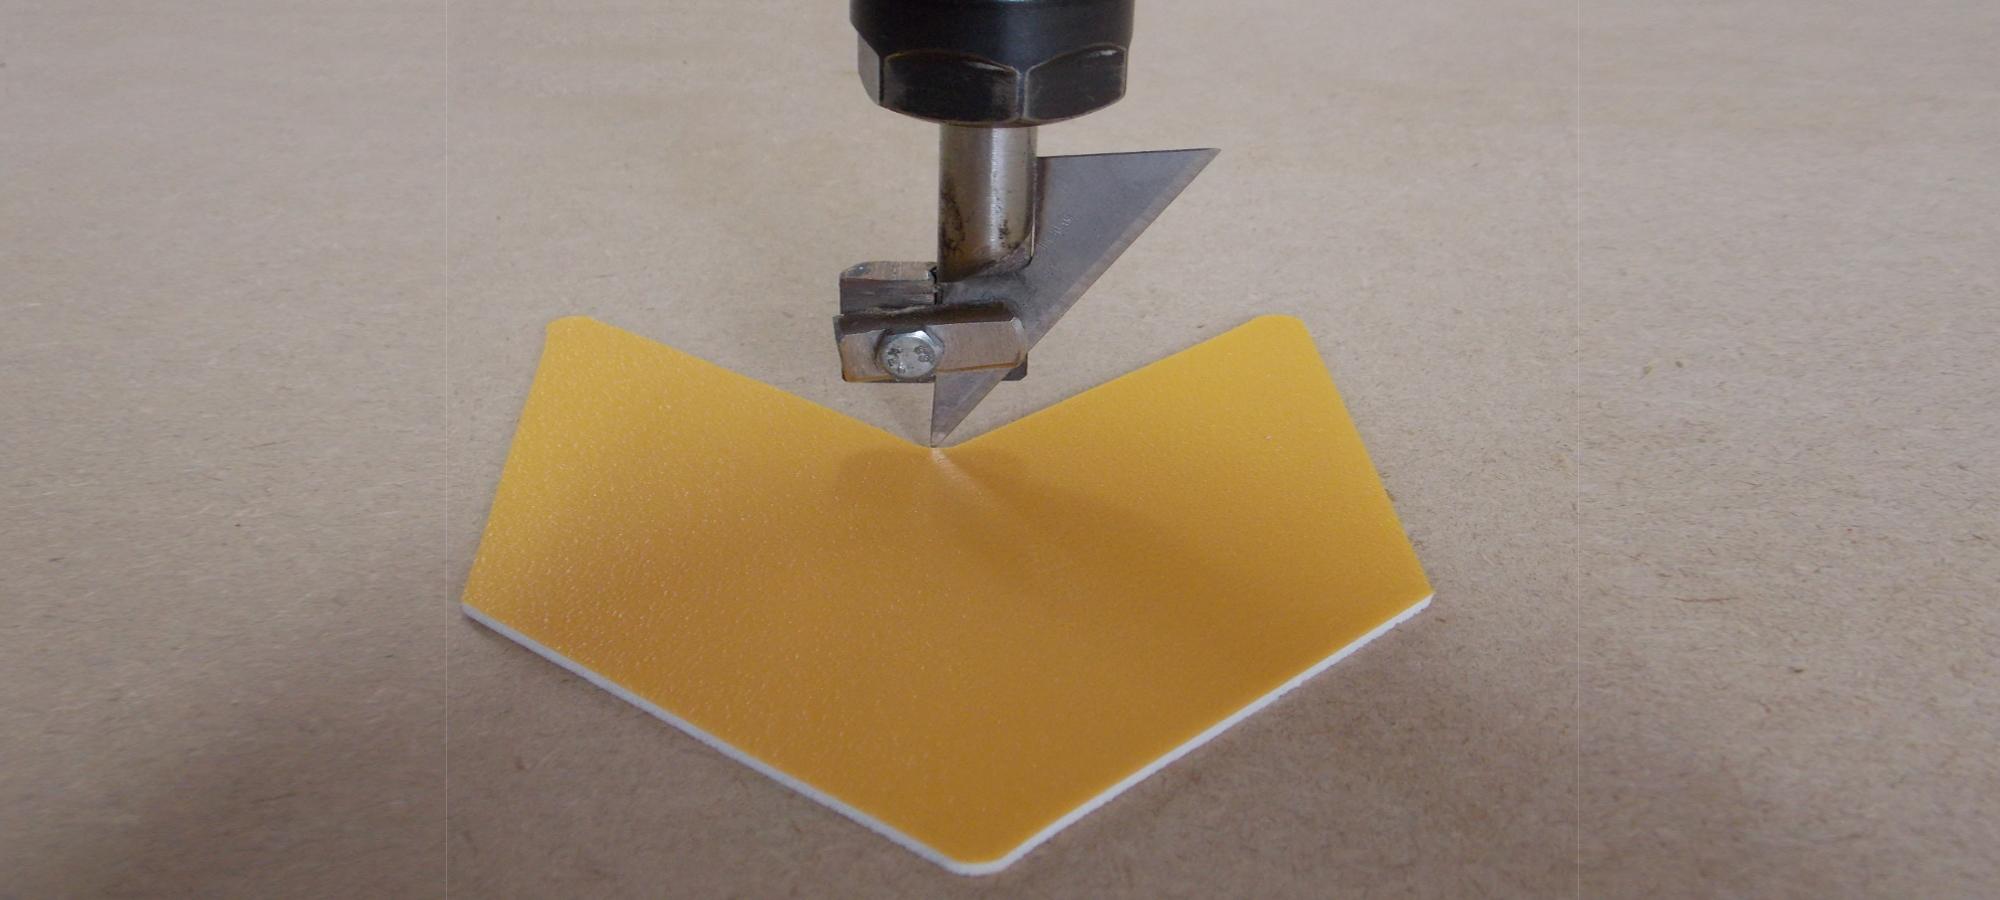 Drag knife cutting switch plate Designer: Stuart Watts